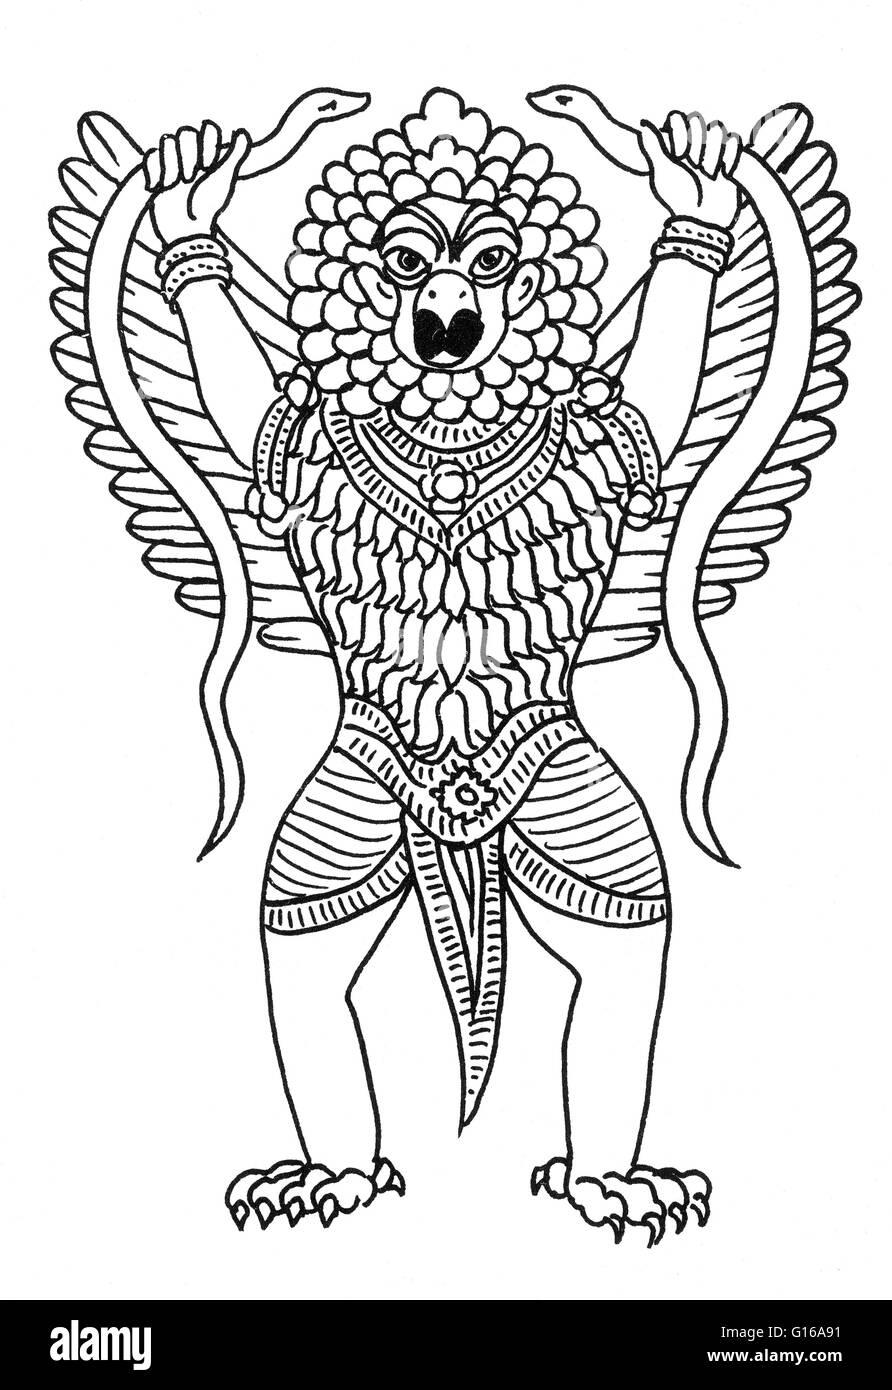 The Garuda is a large mythical bird or bird-like creature that appears in both Hindu and Buddhist mythology. Garuda - Stock Image